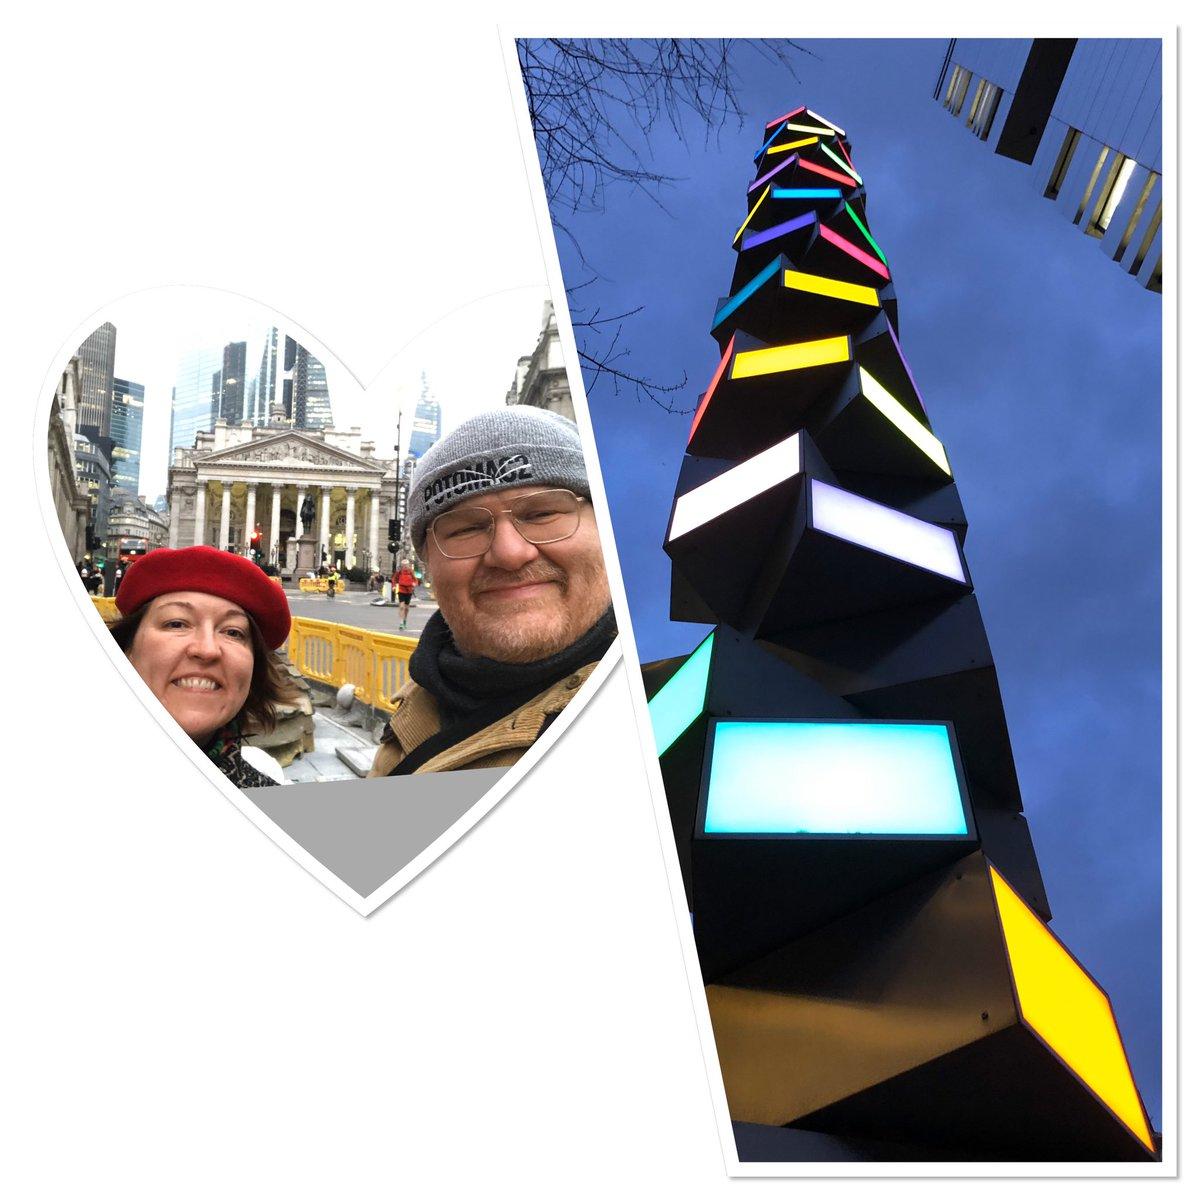 #happyfriday #cityoflondon #london #actors #scriptreading #tvepisode #movies #filmmaking #screenwriting #actorslife #screenwriterslife #filmmakerslife #fun #joy #selfie @nickvonschlippe